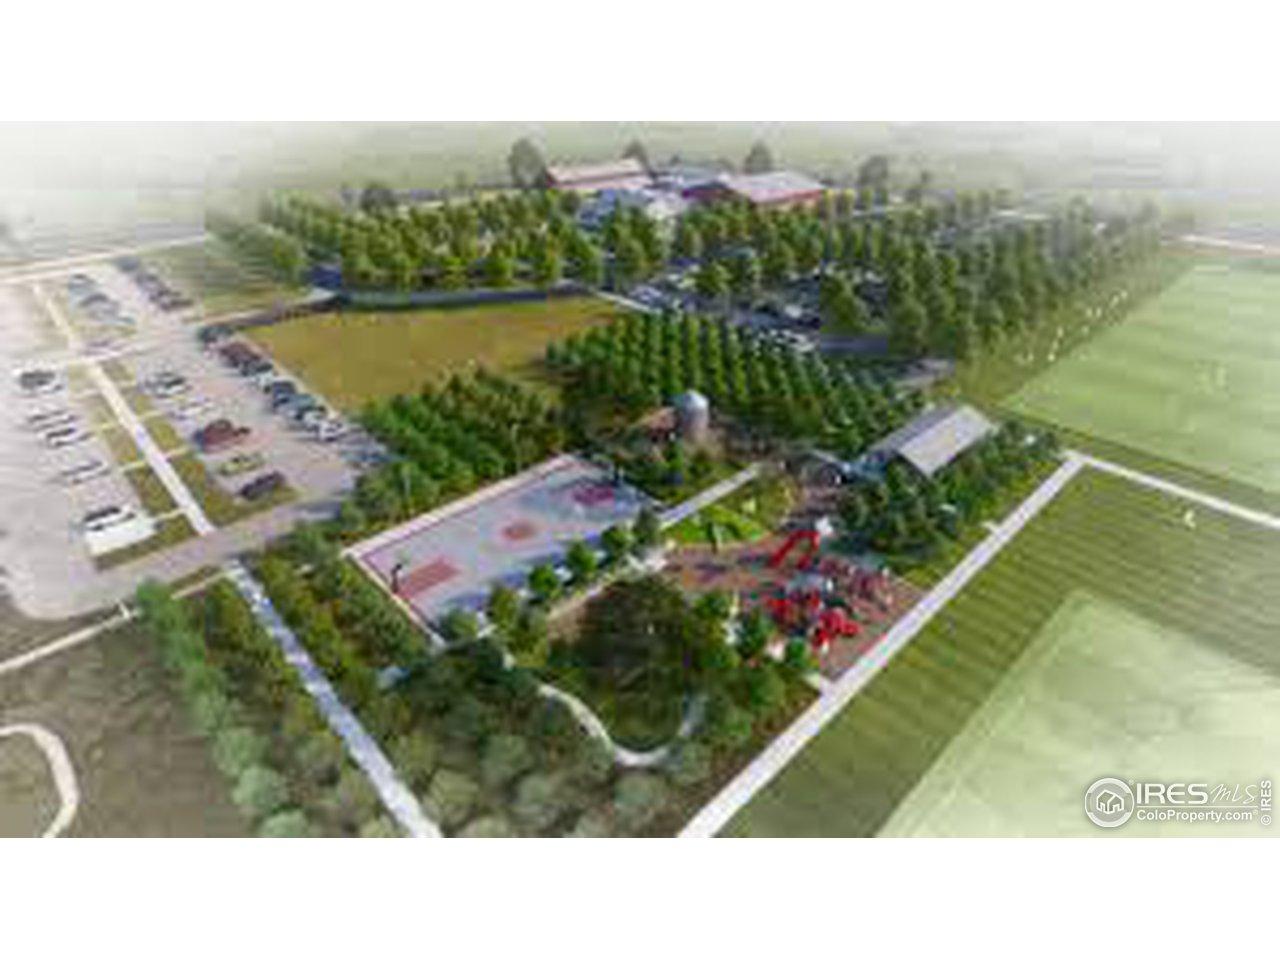 RENDERINGS   Waggener Farm Park & Recreation Cente